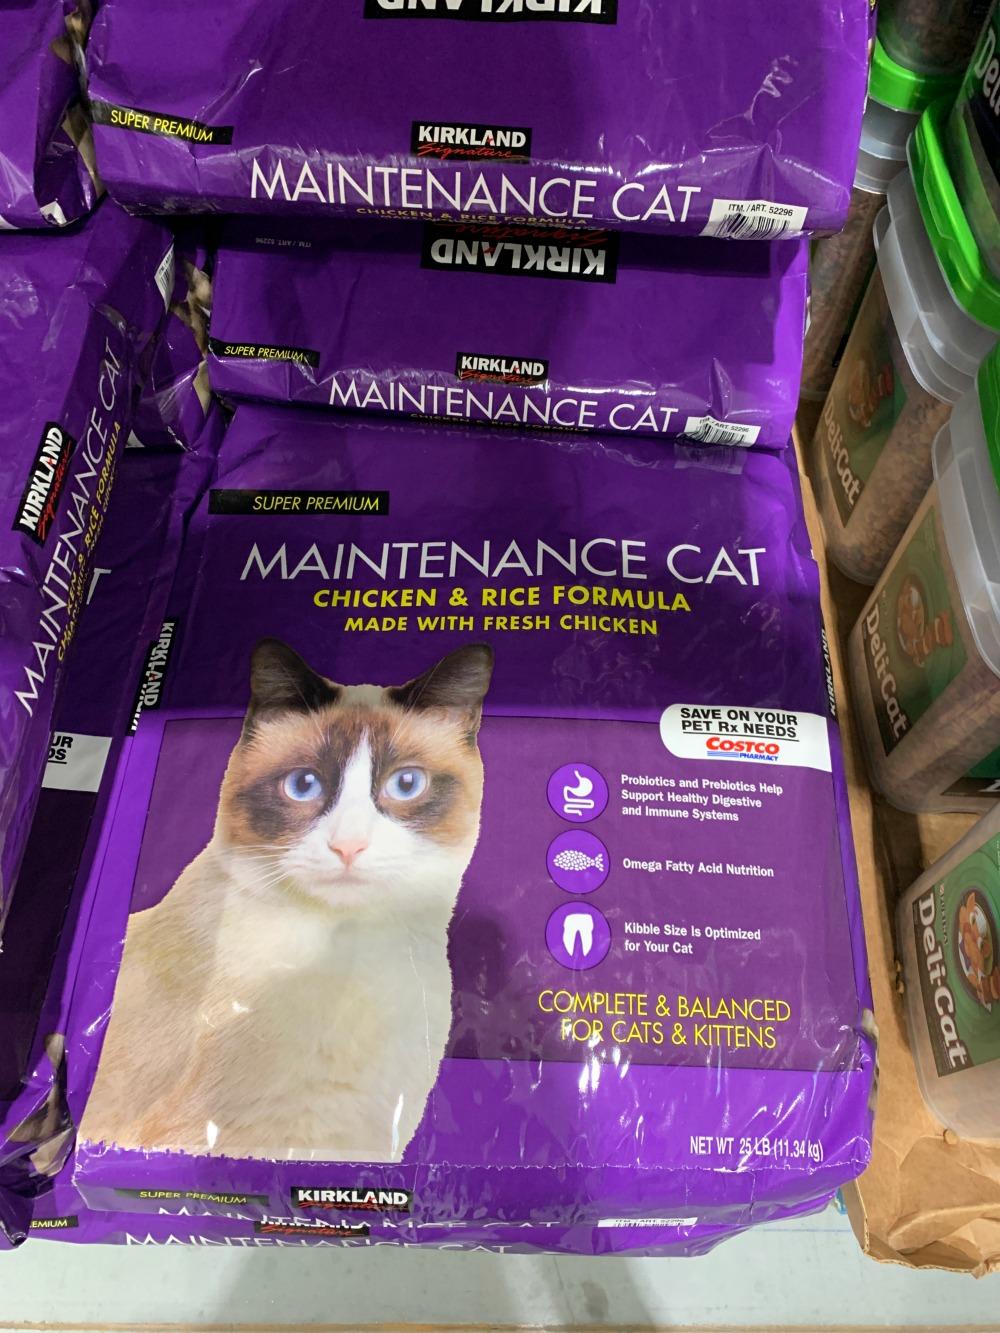 purple bag of Kirkland Signature Maintenance Cat food at Costco